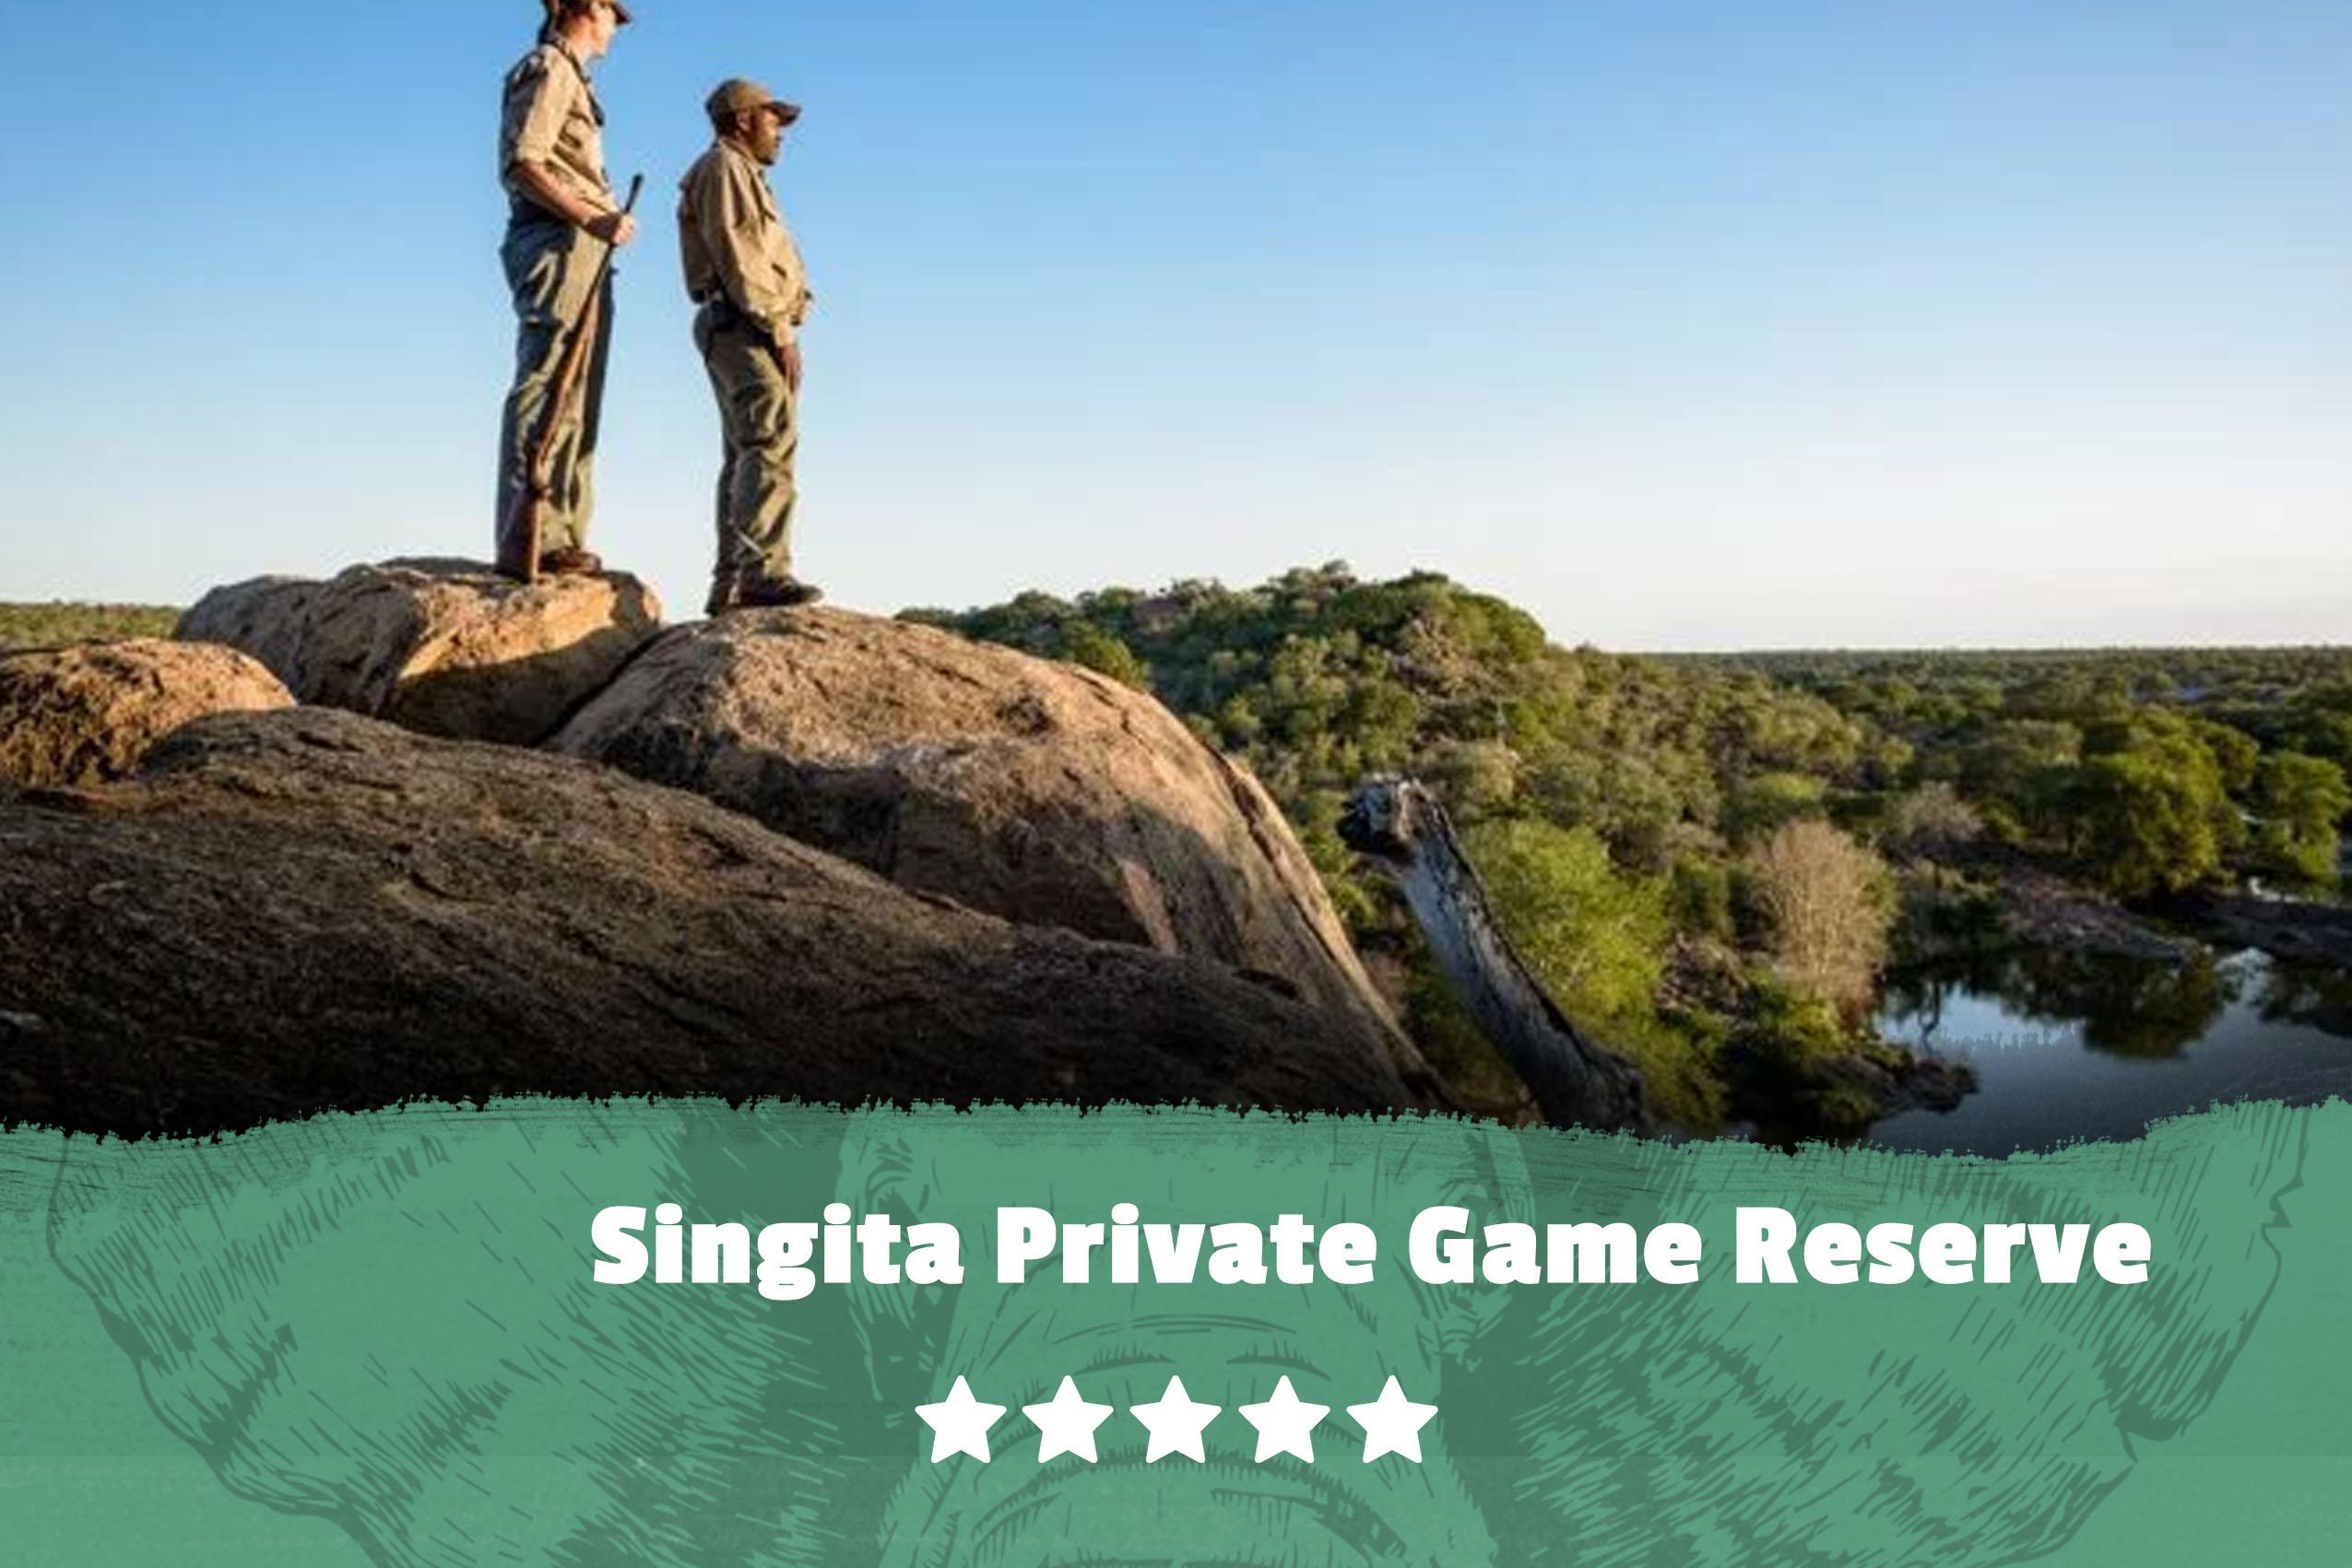 Kruger featured image Singita Private Game Reserve